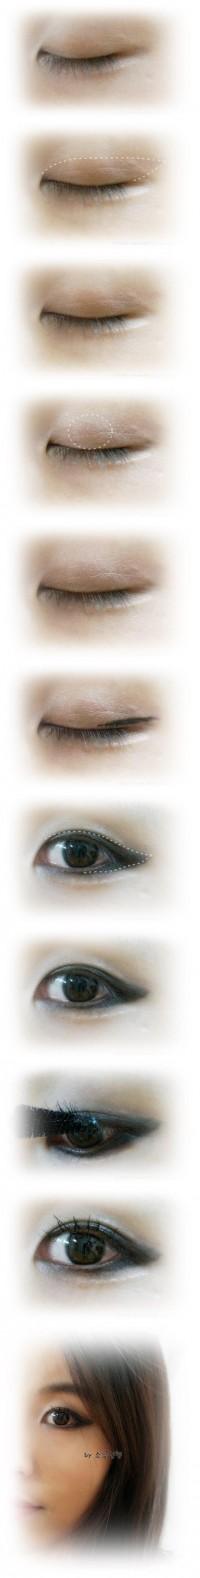 Make Up_cat's eye